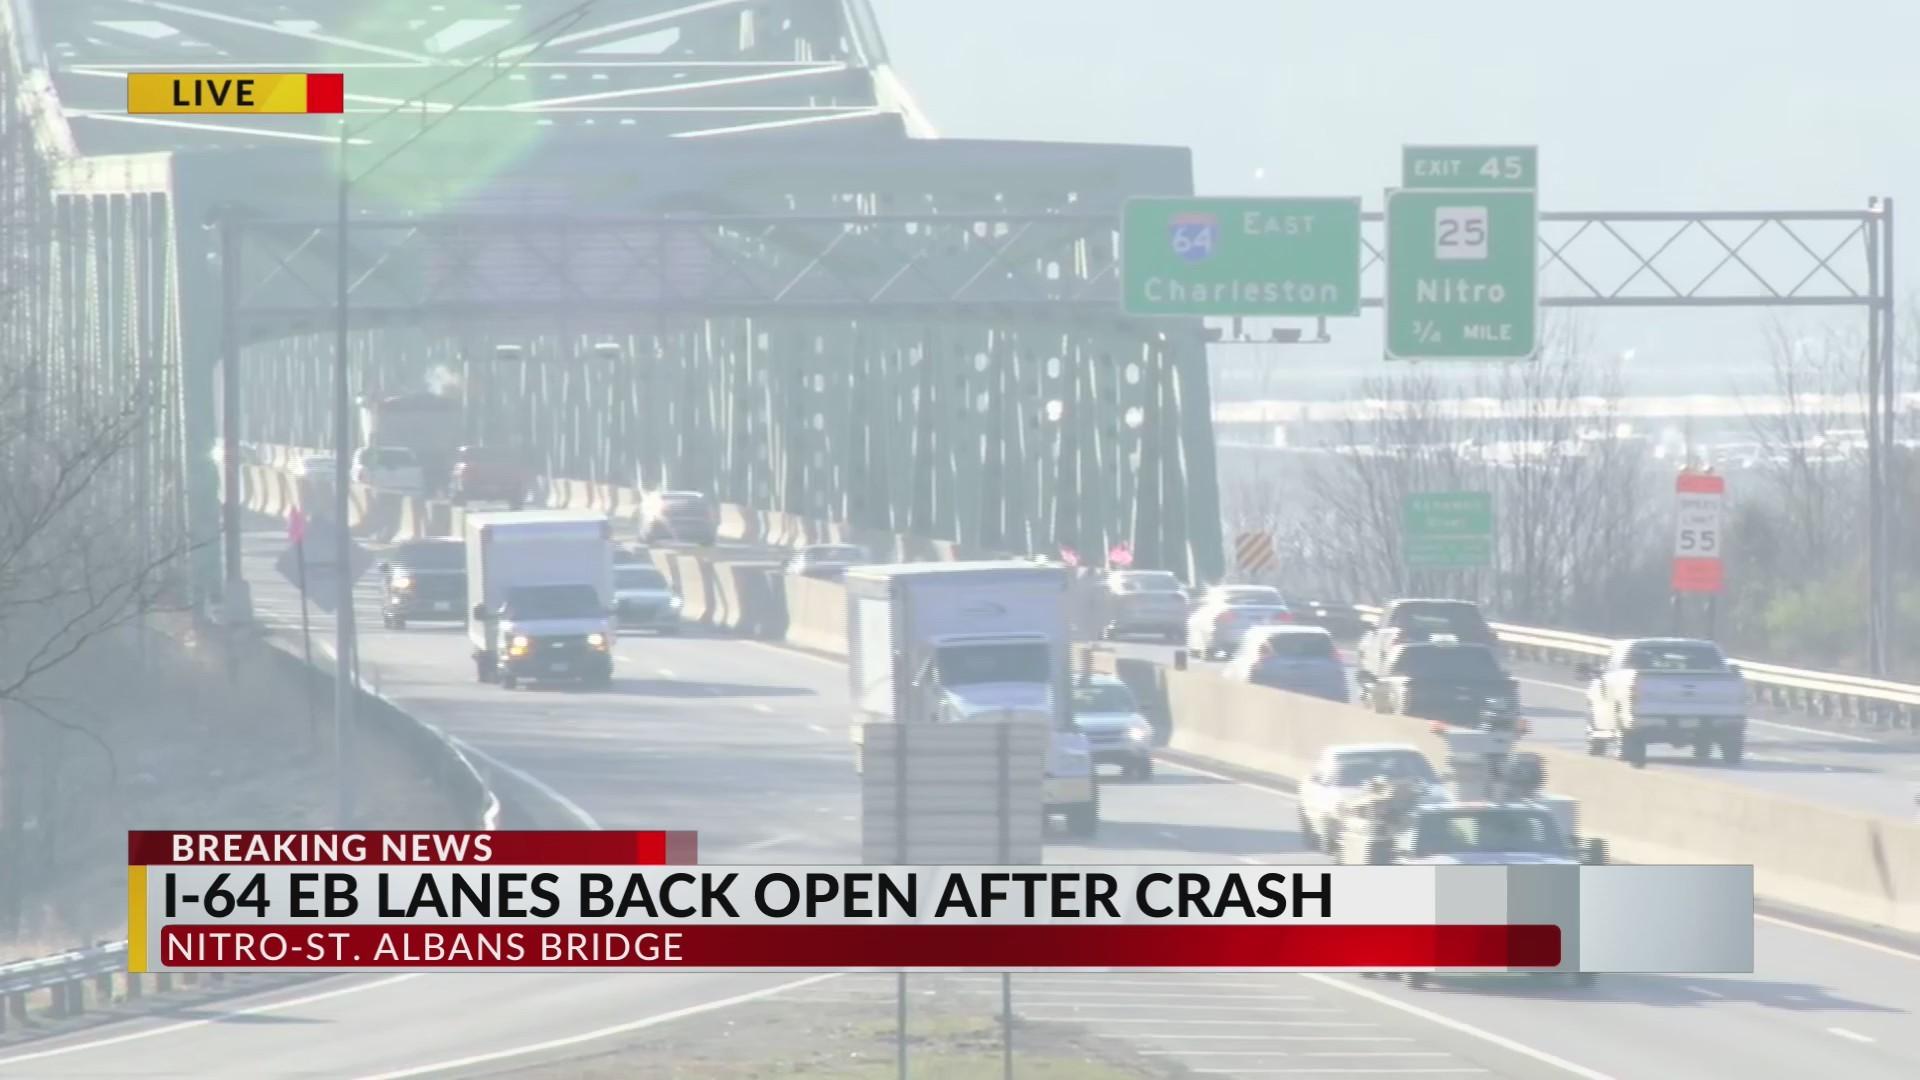 I-64 East Bound Lanes at Nitro Bridge Back Open after Crash